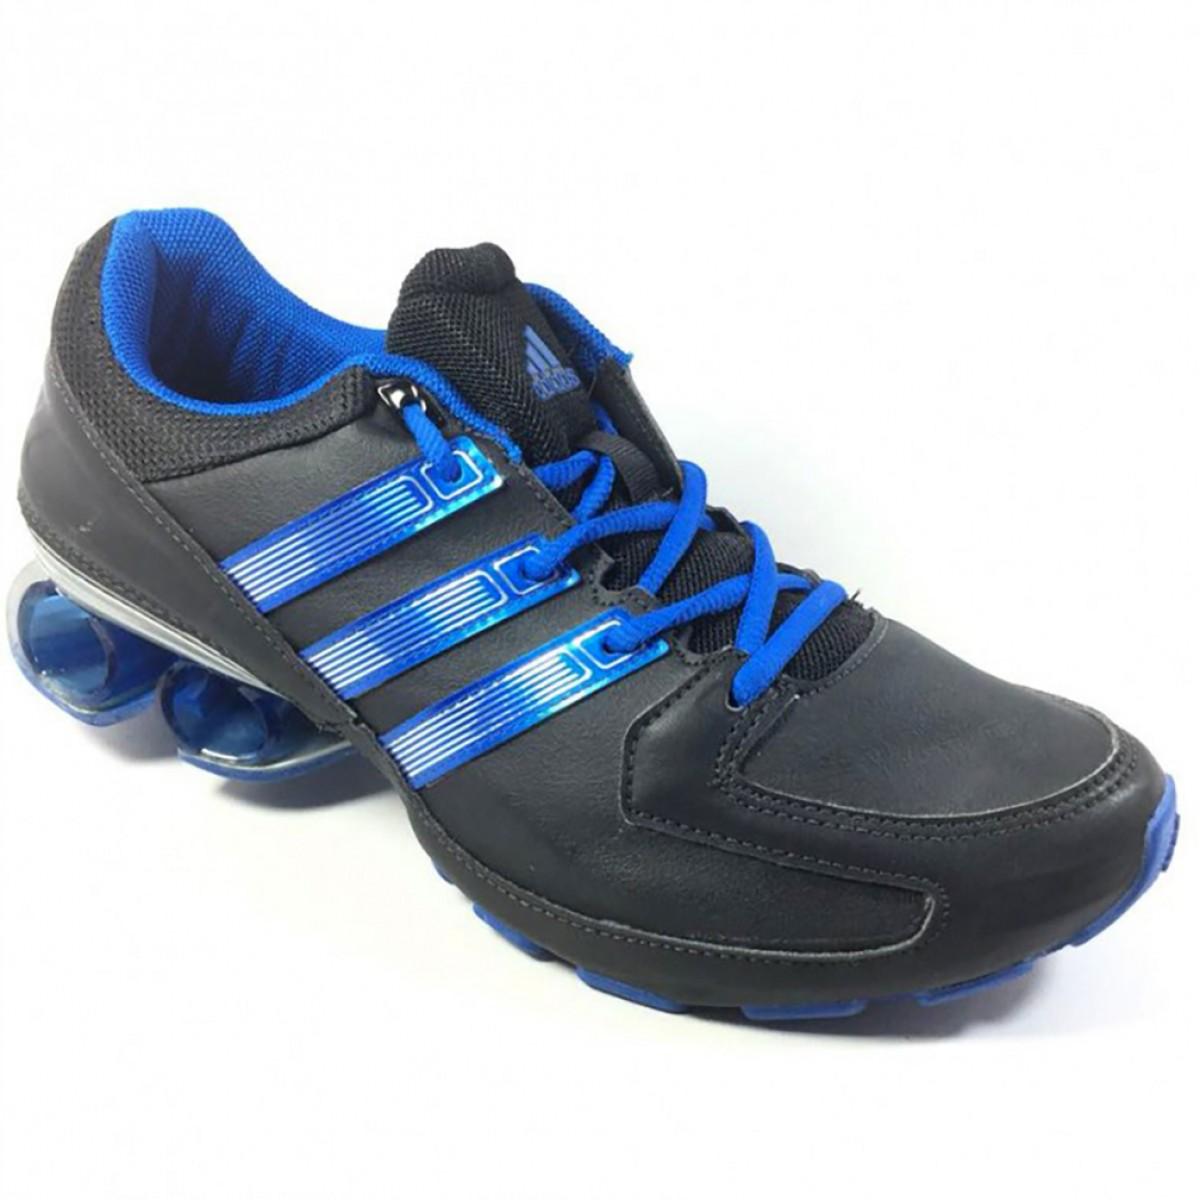 1e89bb2eae3 Tênis Masculino Adidas Komet Syn Azul - Compre Agora